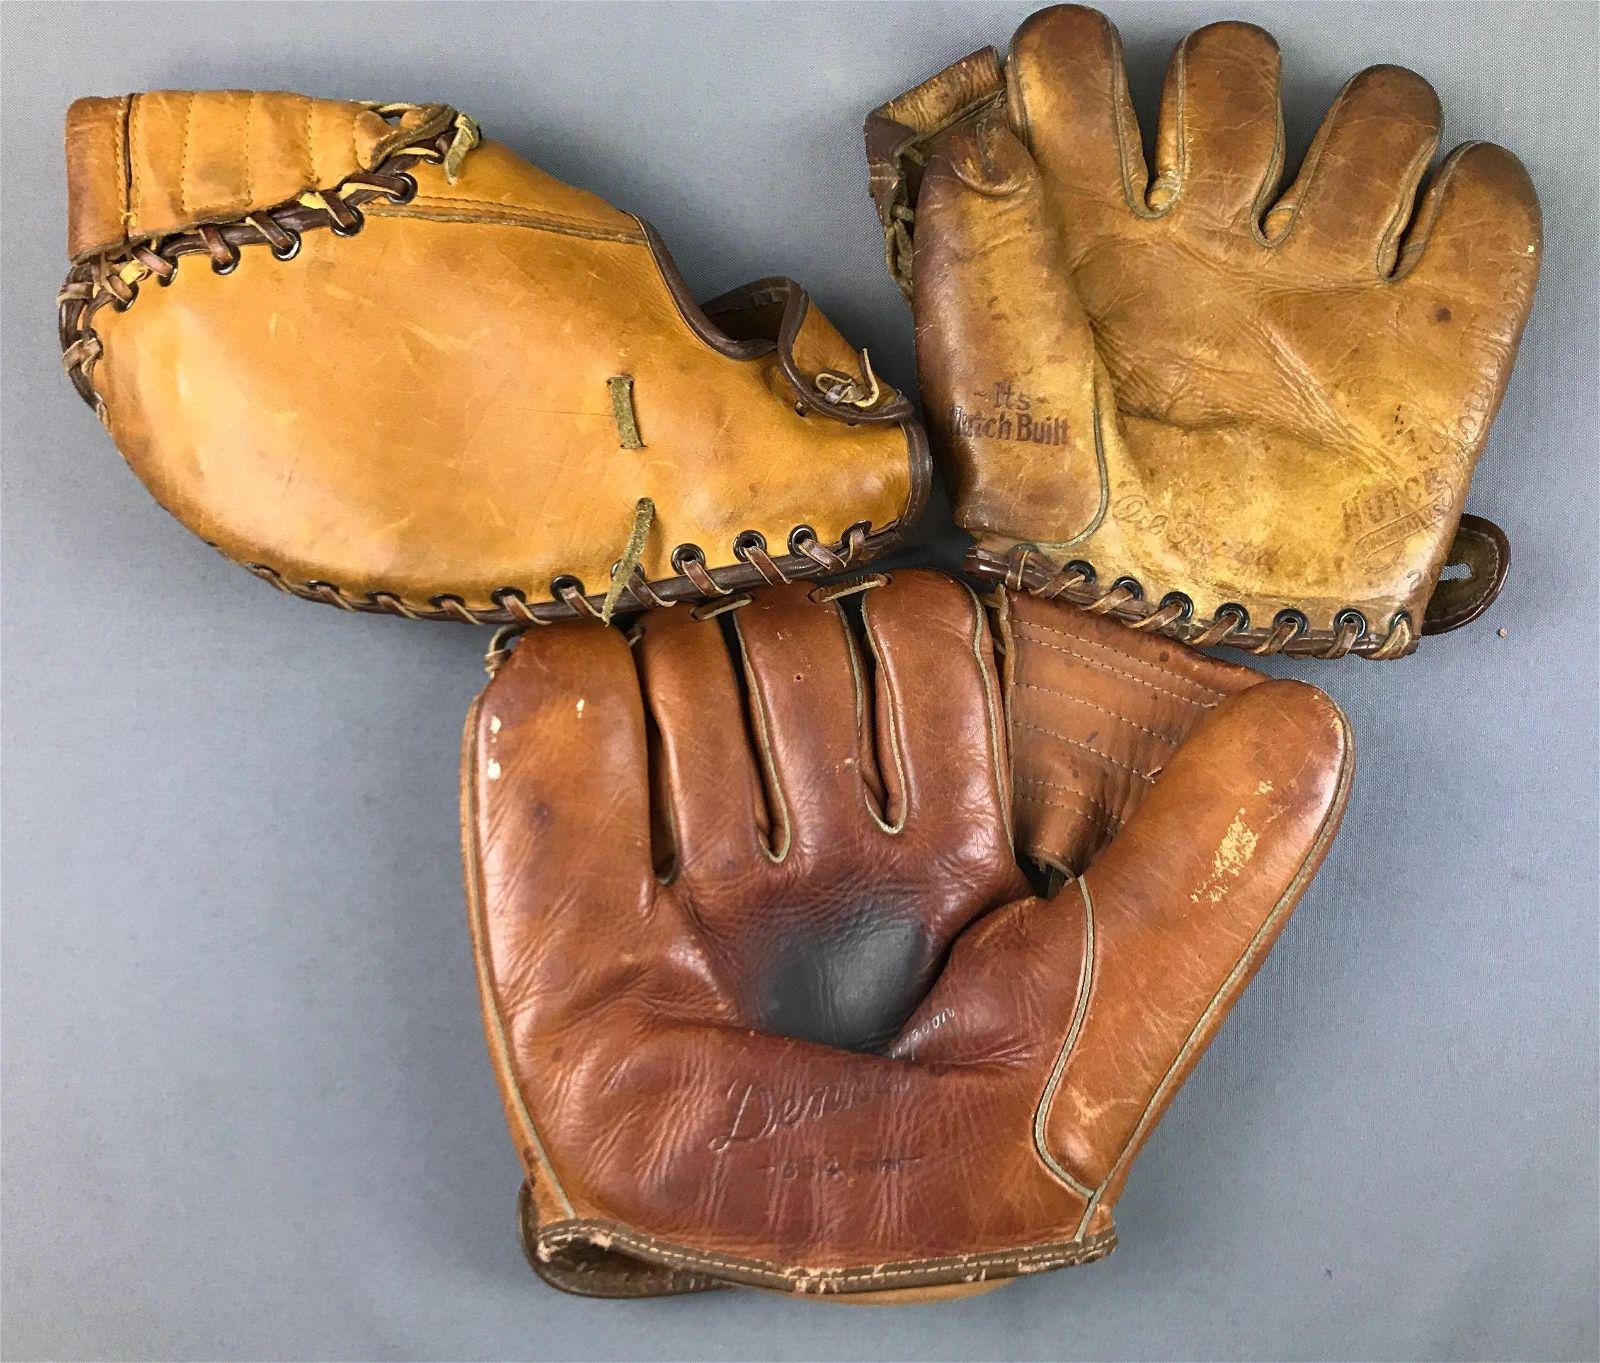 Group of 3 : Vintage Baseball Gloves